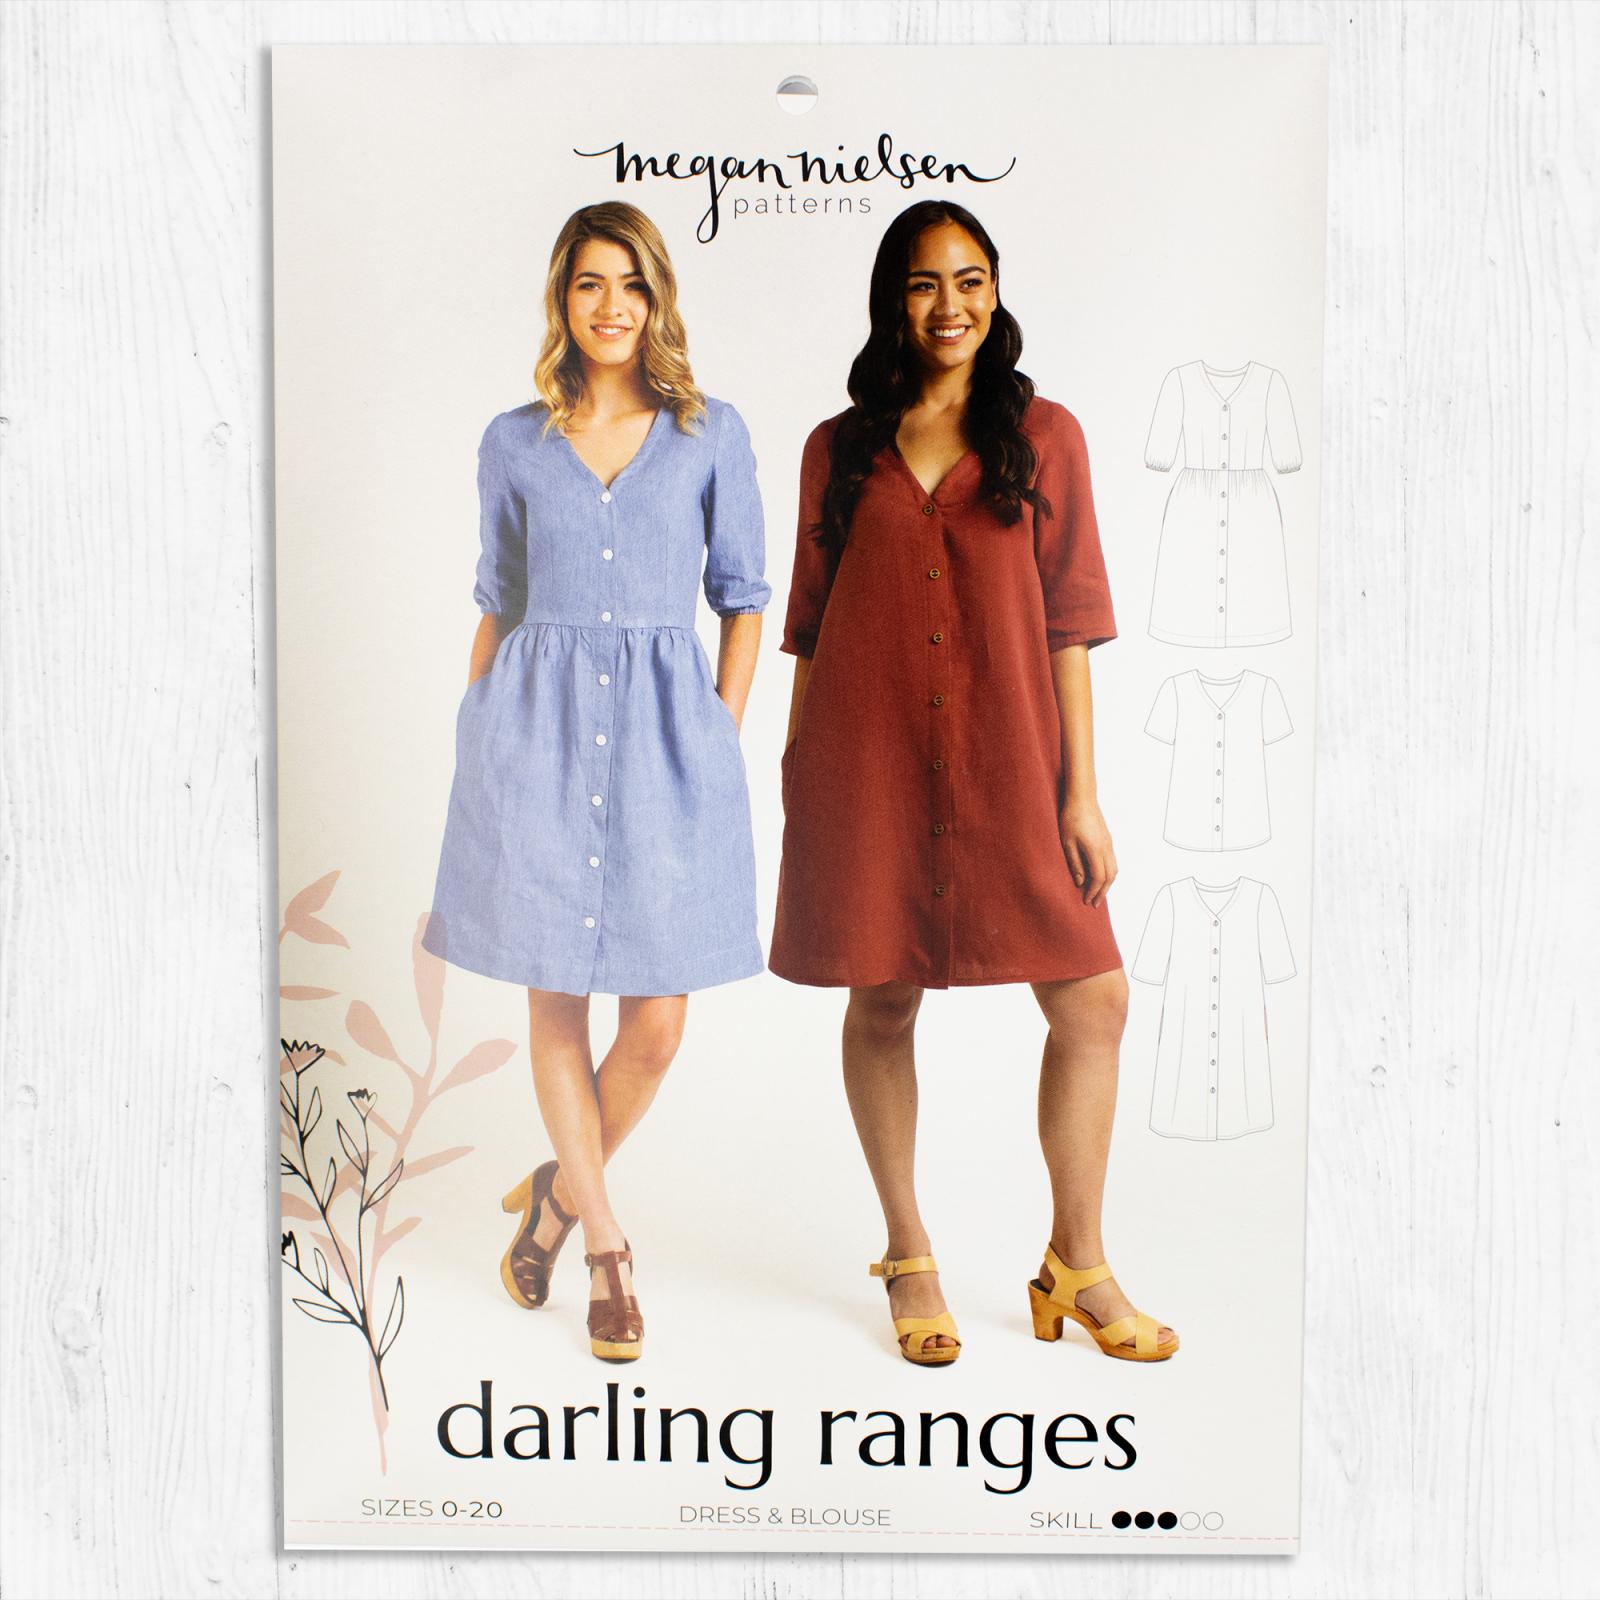 Megan Nielsen Patterns - Darling Ranges